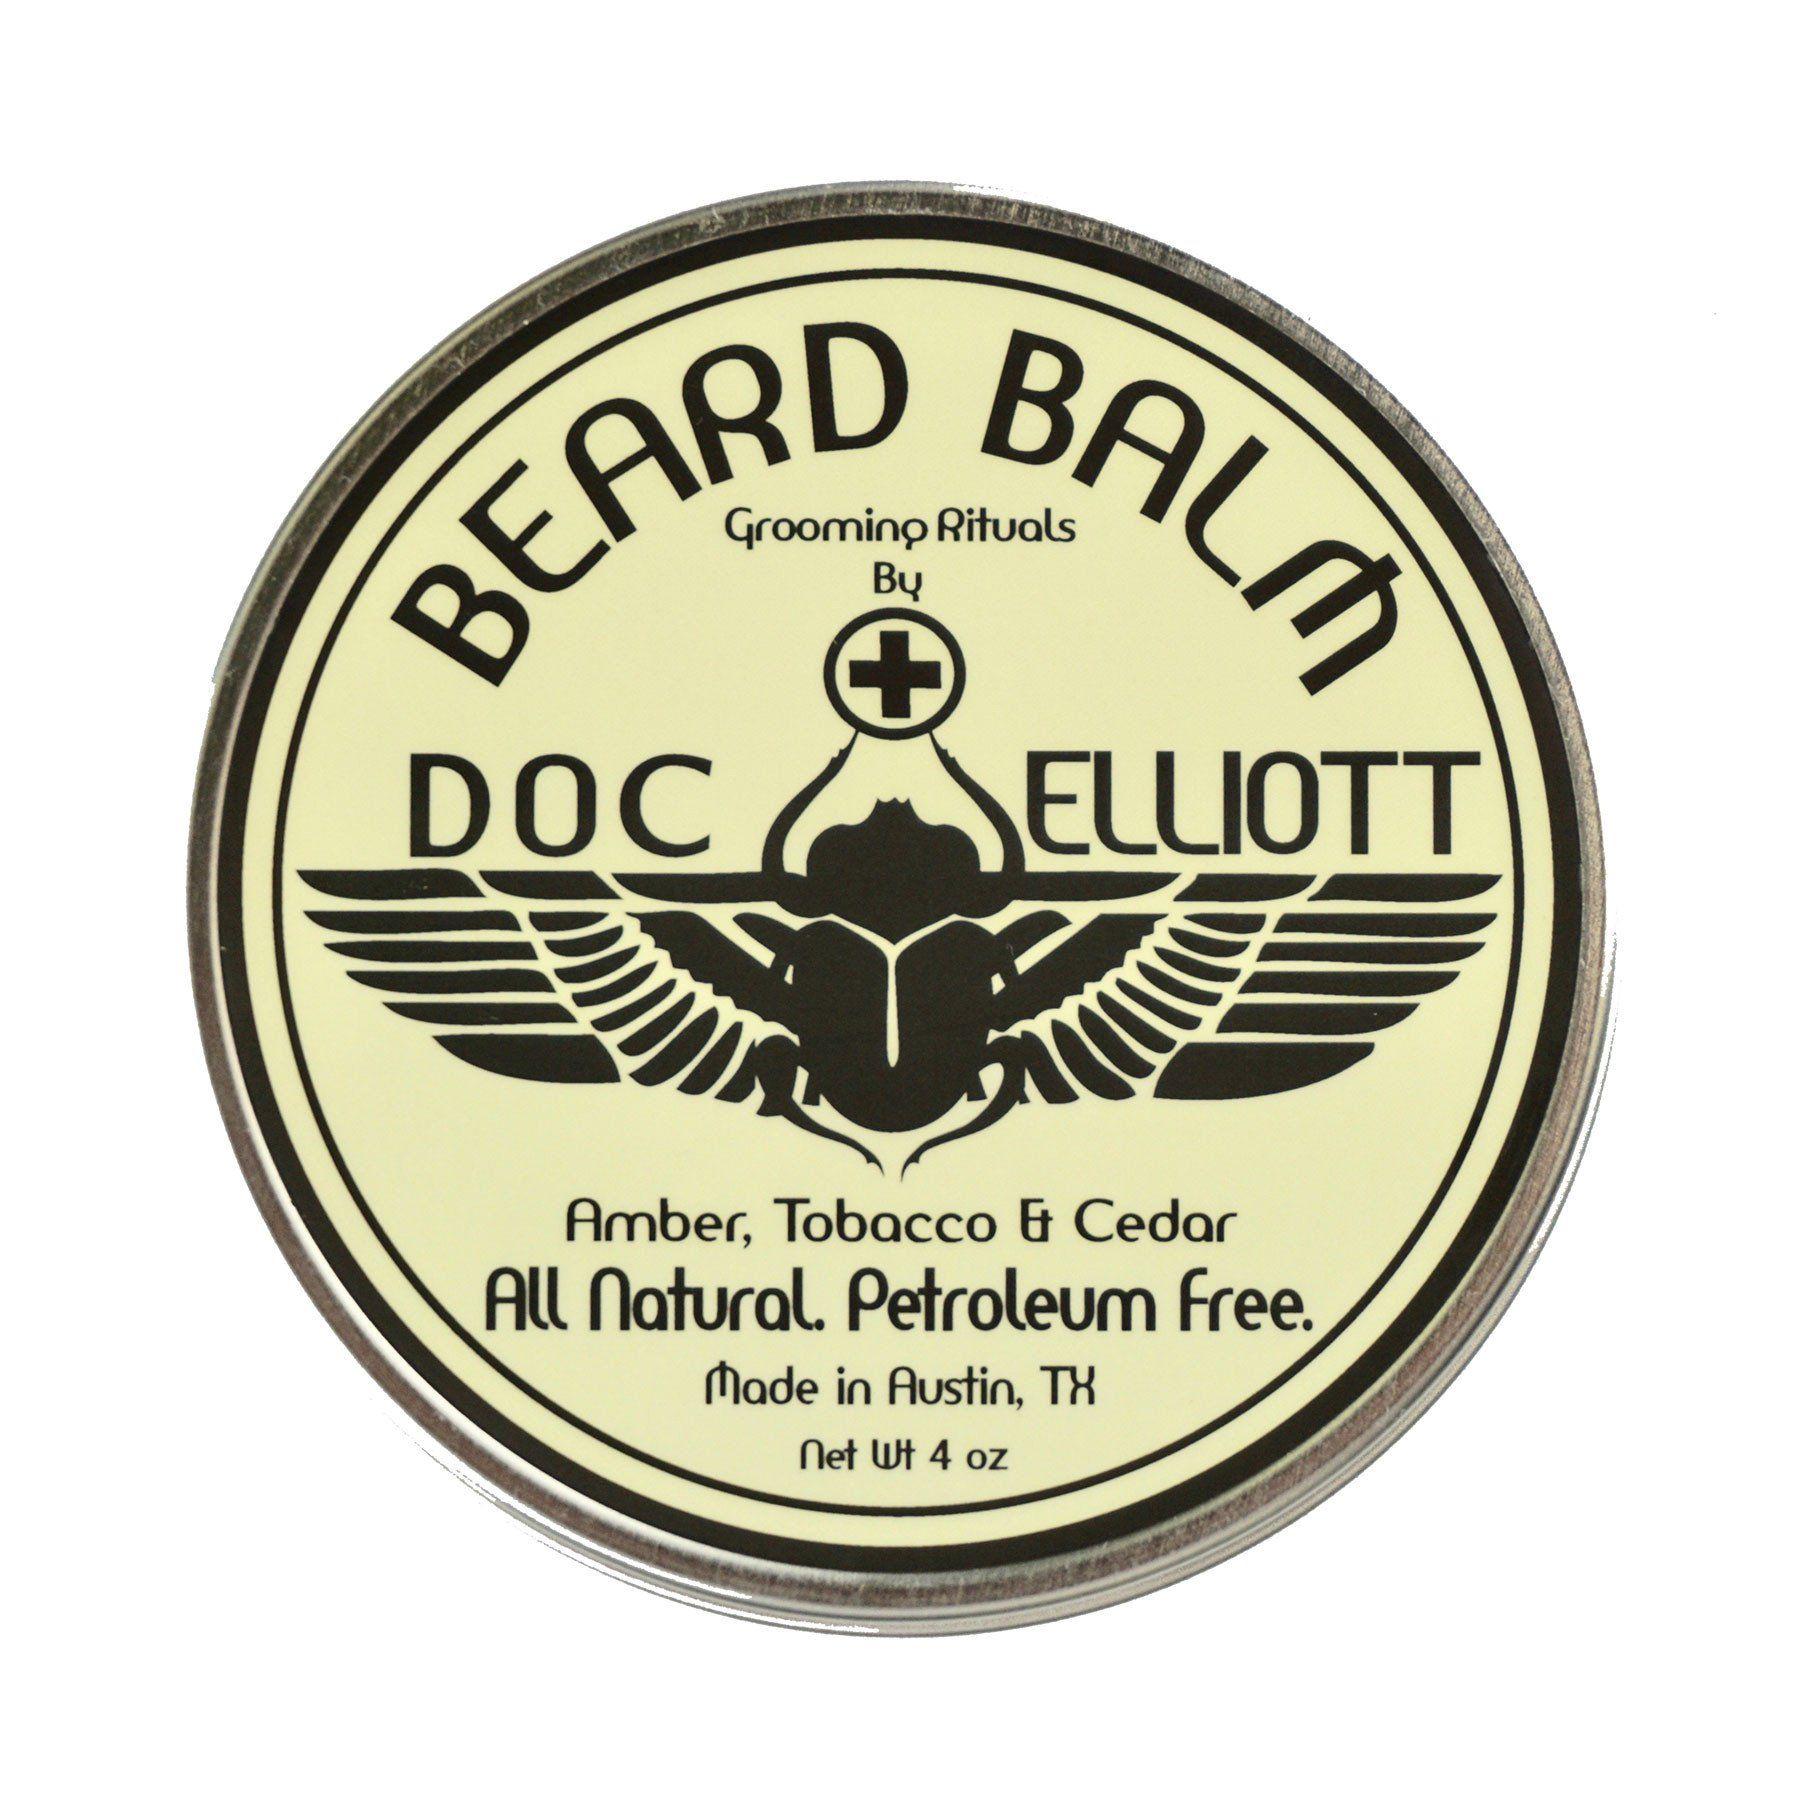 Classic Beard Balm White Label